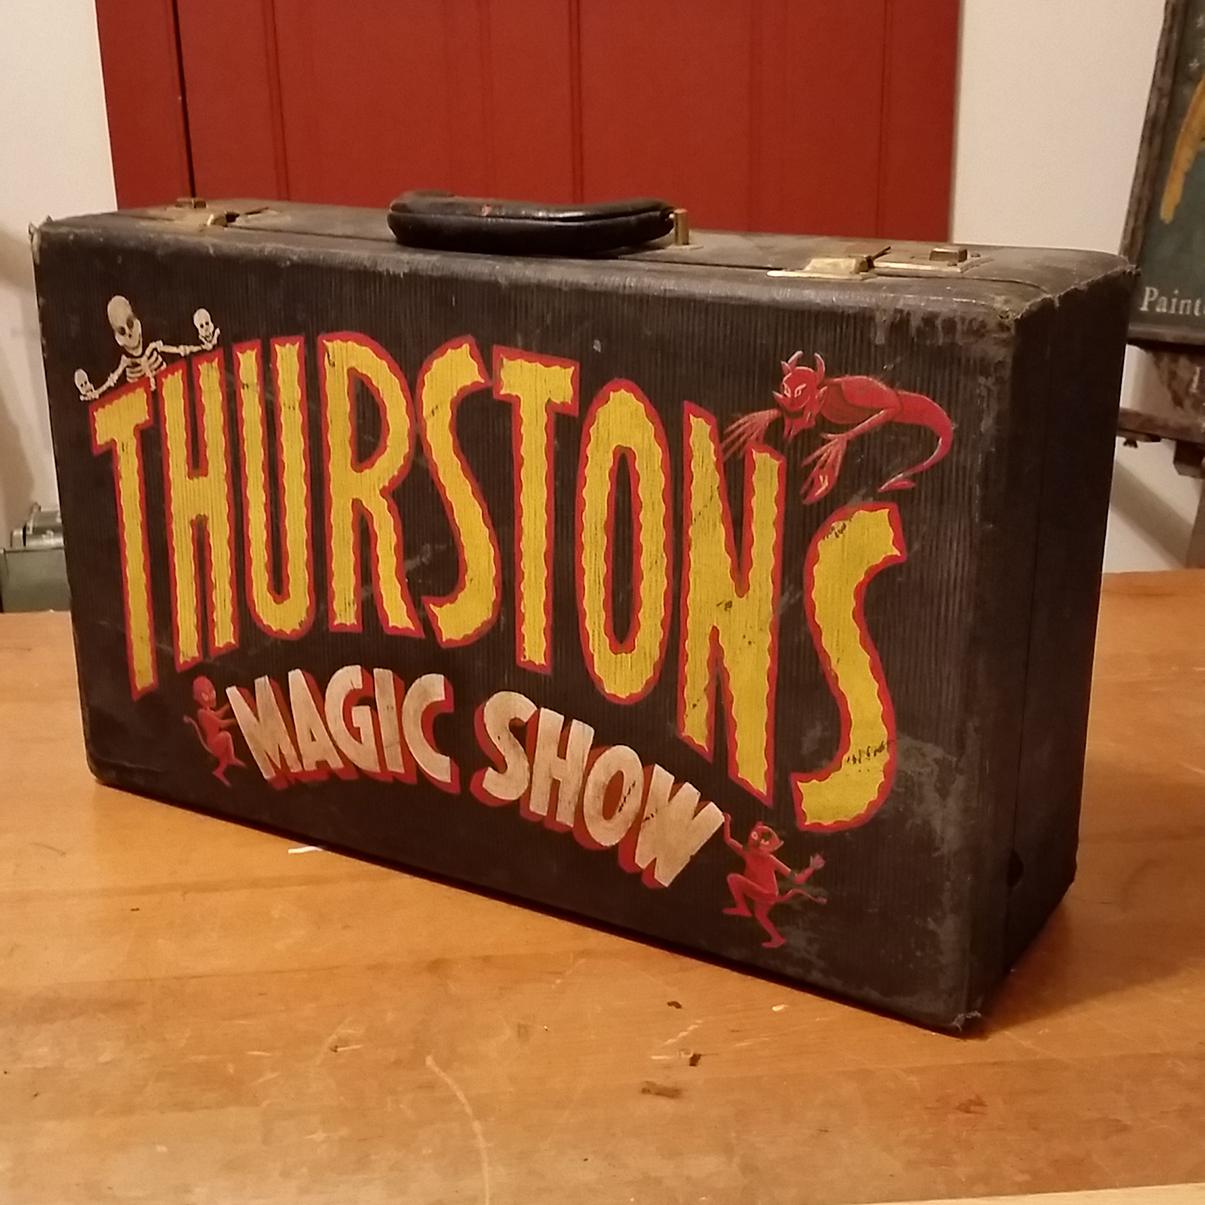 Thurston's Case